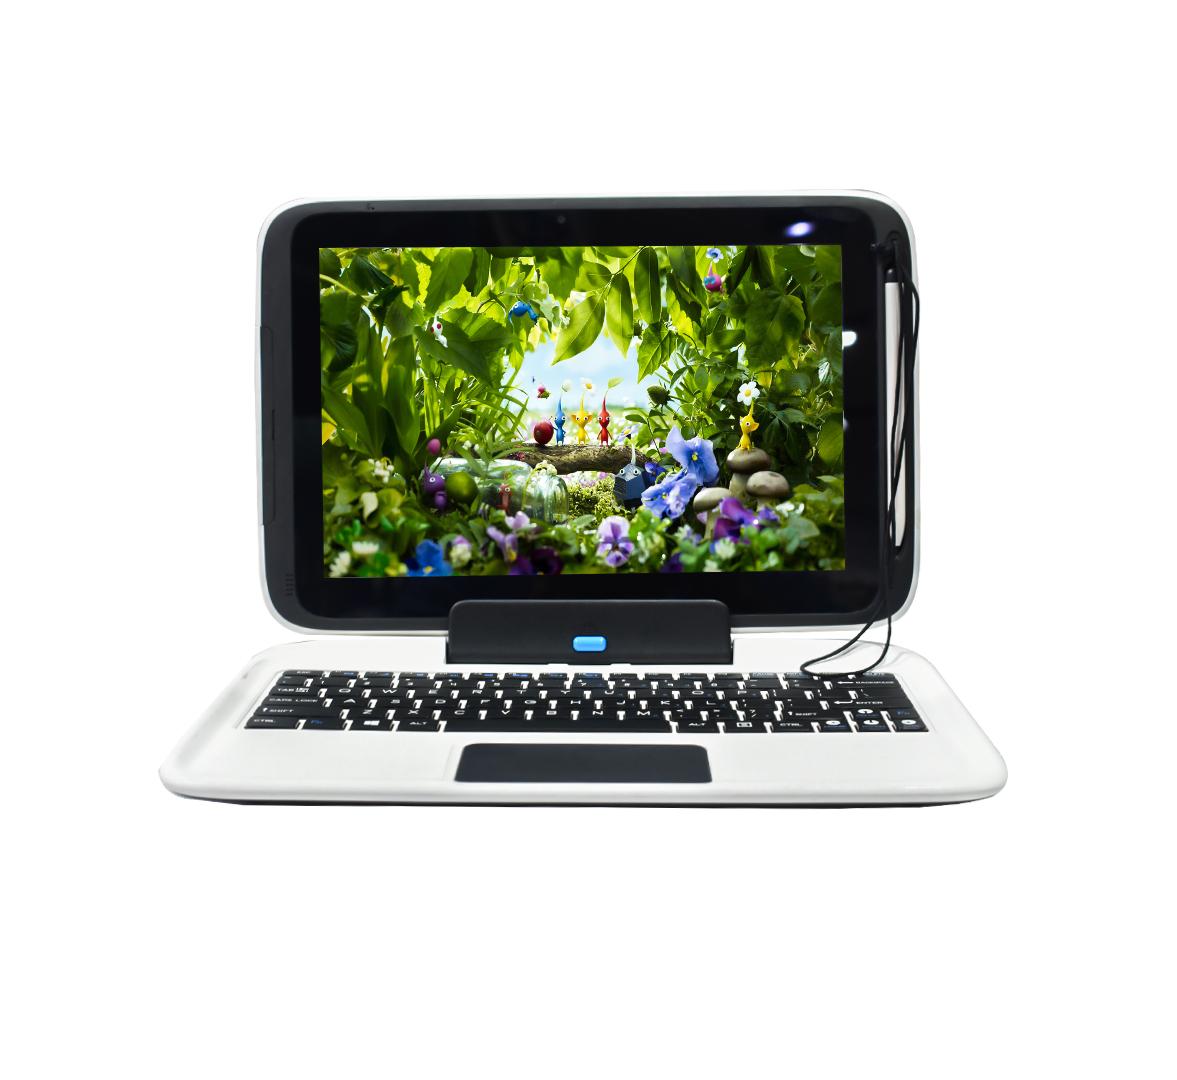 CTL 2 Go PC NL5 2- in -1 Laptop, INTEL ATOM CPU, 2GB DDR3 BUILTIN RAM, 64GB SSD 2.5, 10 inch Touch Display (Refurbished)